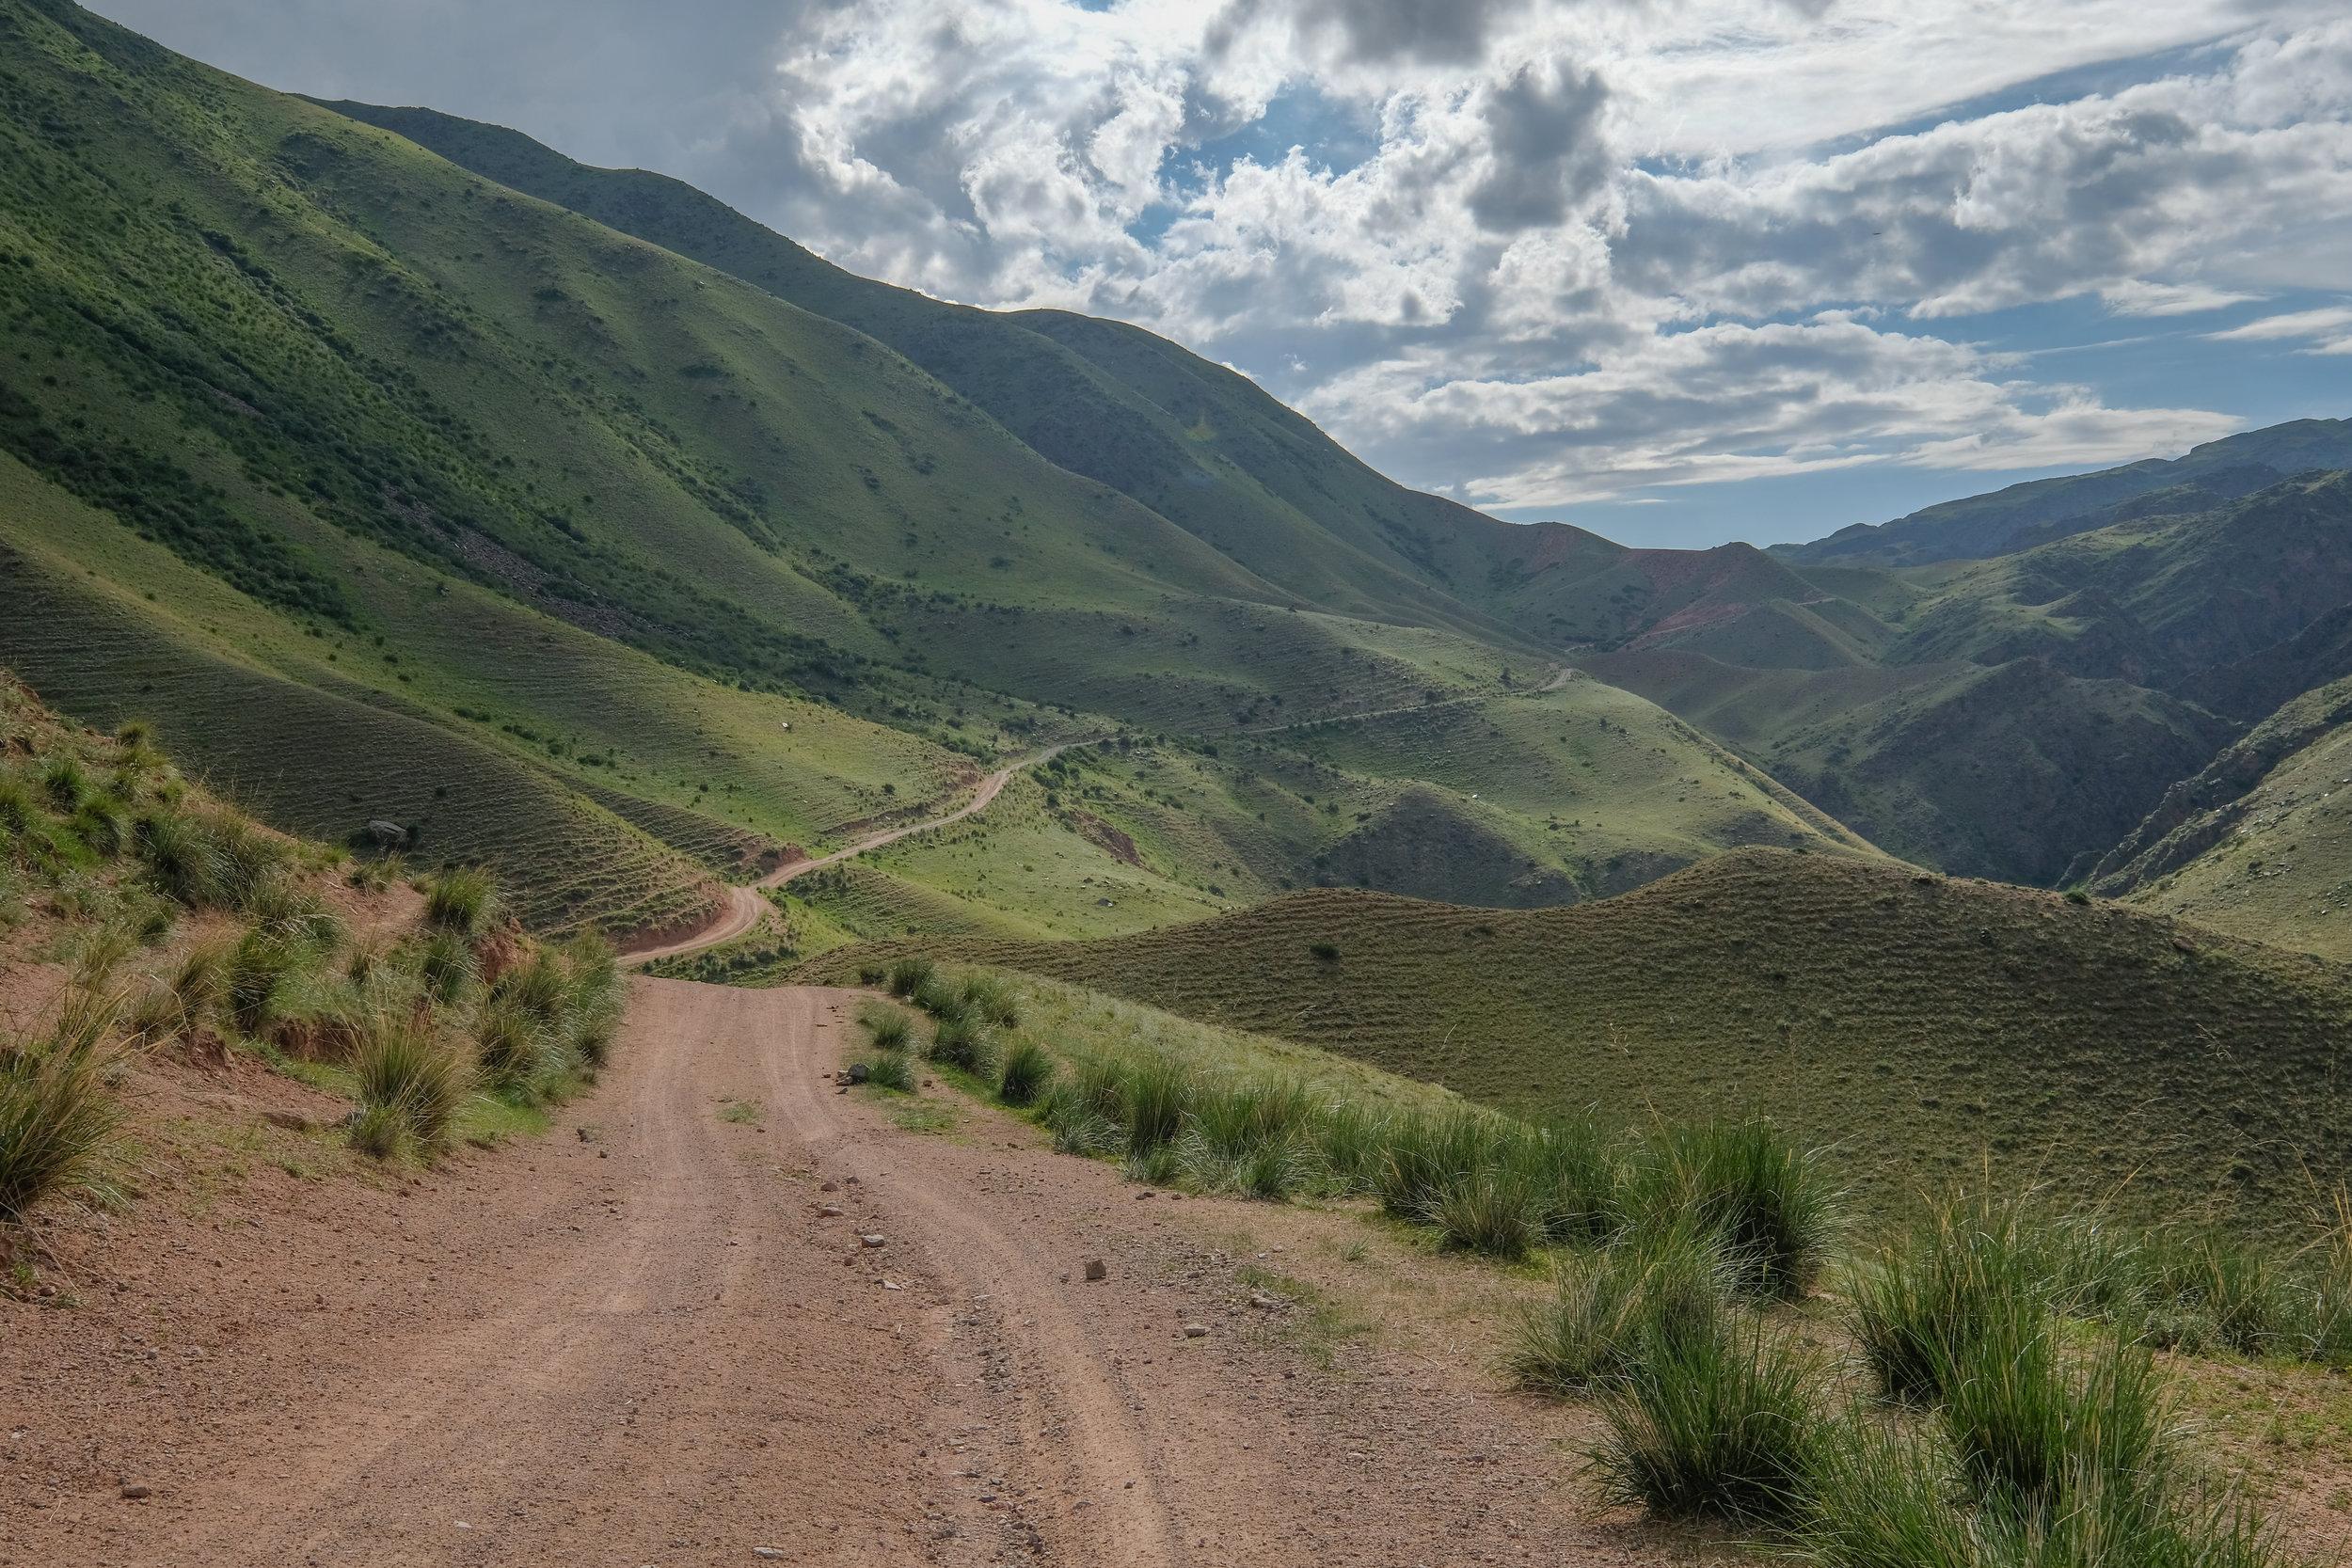 kazakh-corner-route-5167_35080499730_o.jpg